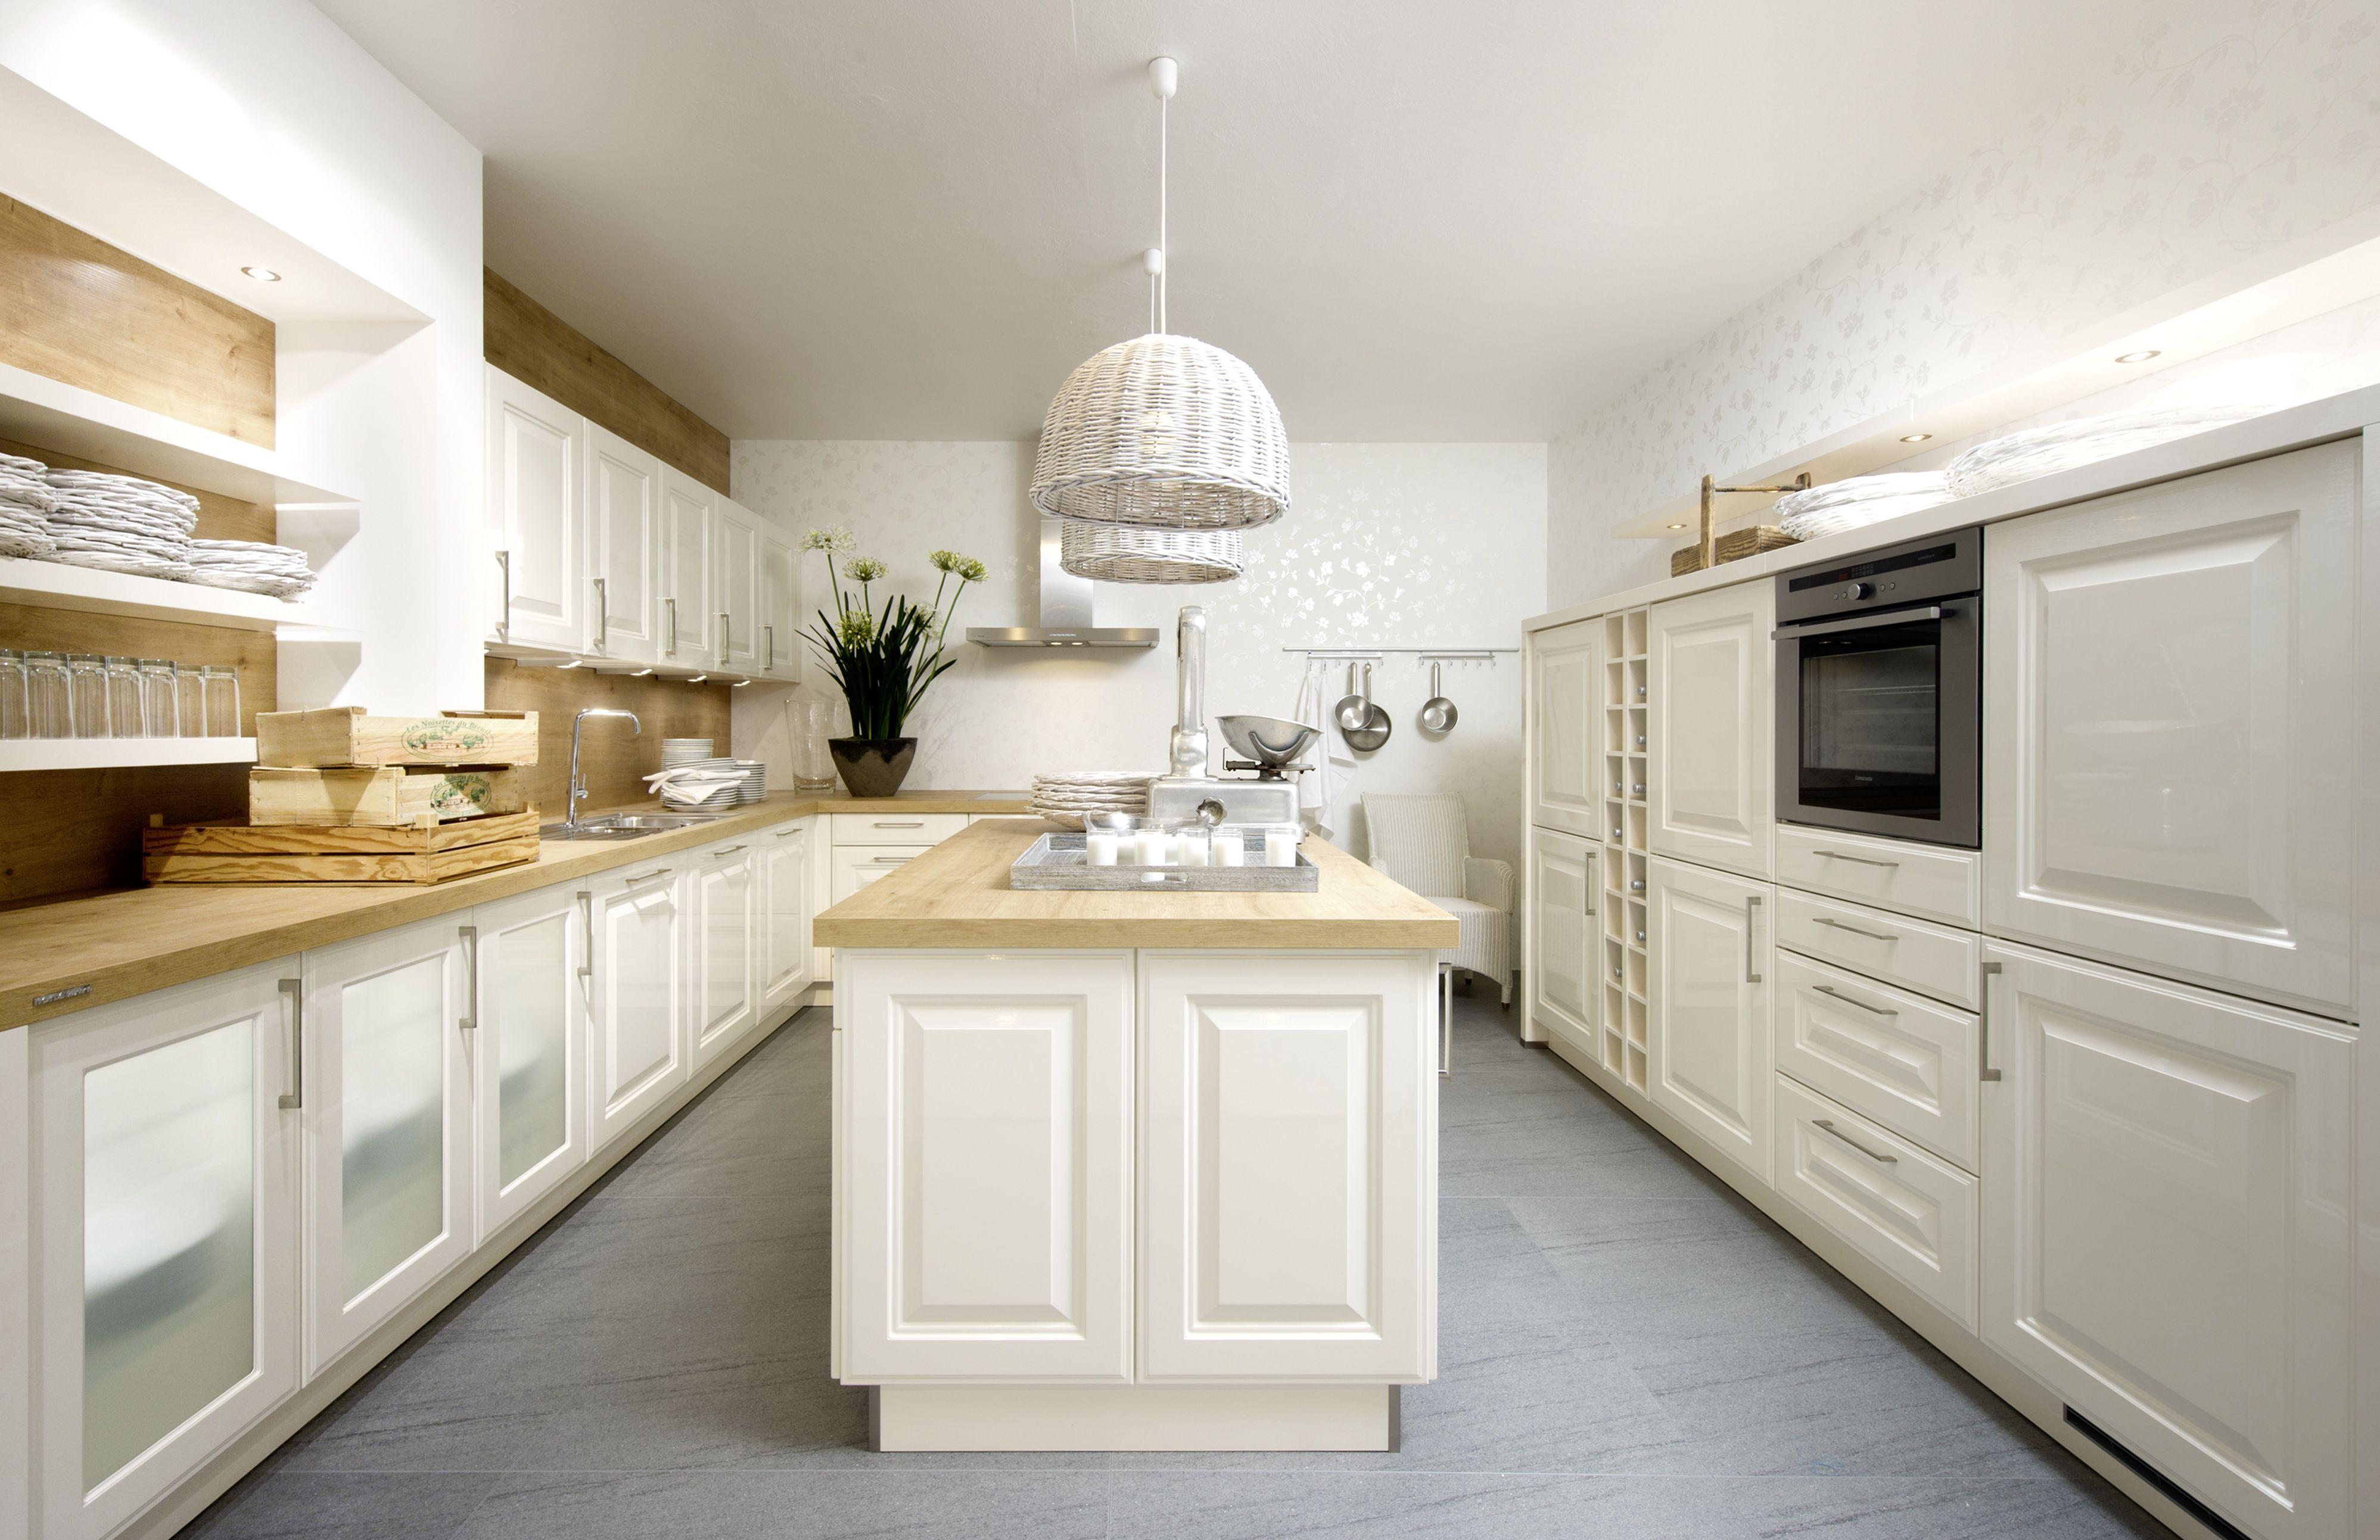 Klassieke Keuken | Tijdloze Keuken | Kookeiland | Wit Hout | Kookeiland · Nolte  KüchenHausbauTraditionellen DesignKüche ...